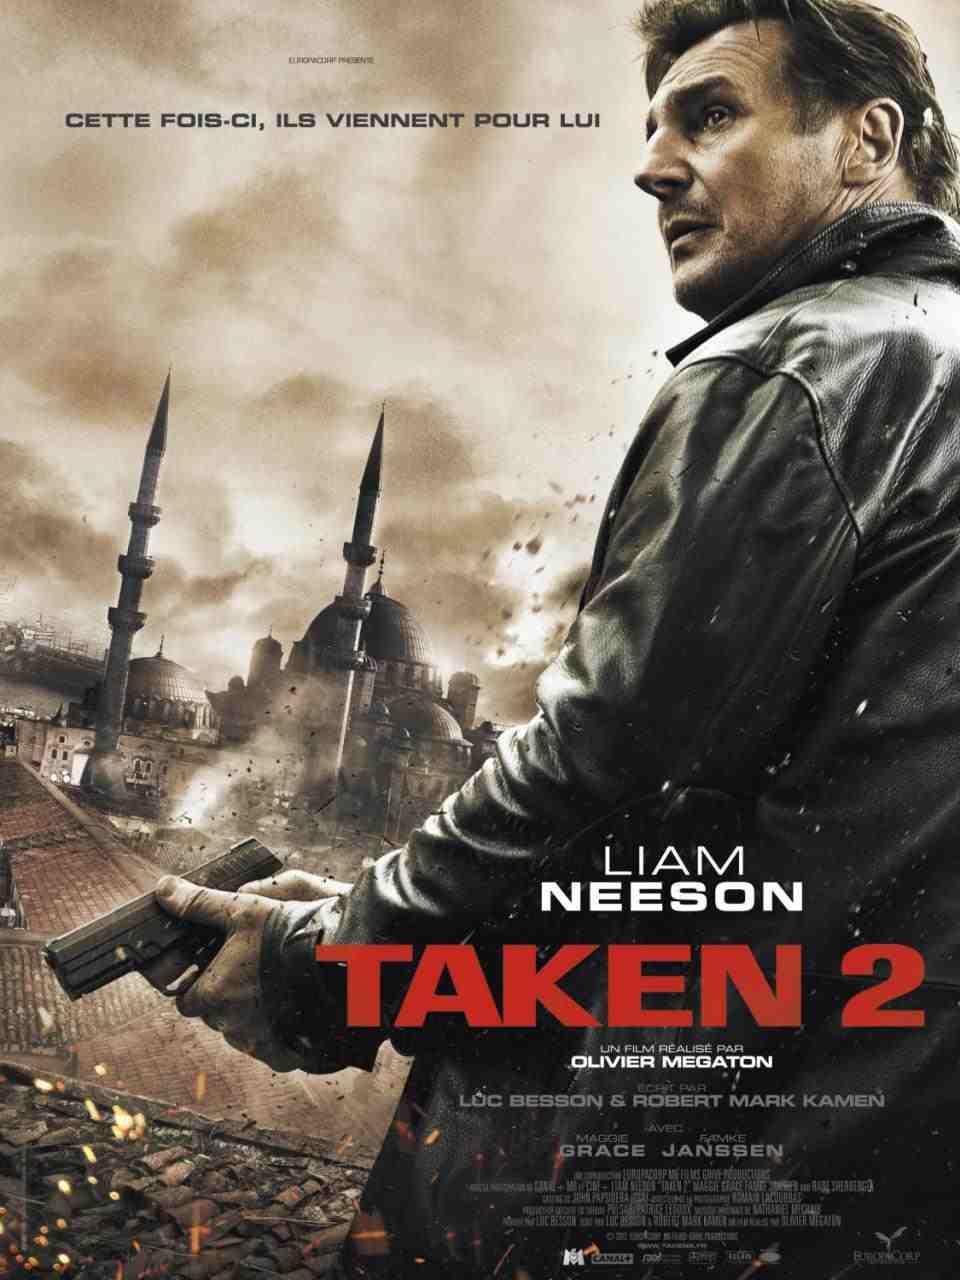 Watch: Taken 2 Theatrical Trailer Starring Liam Neeson